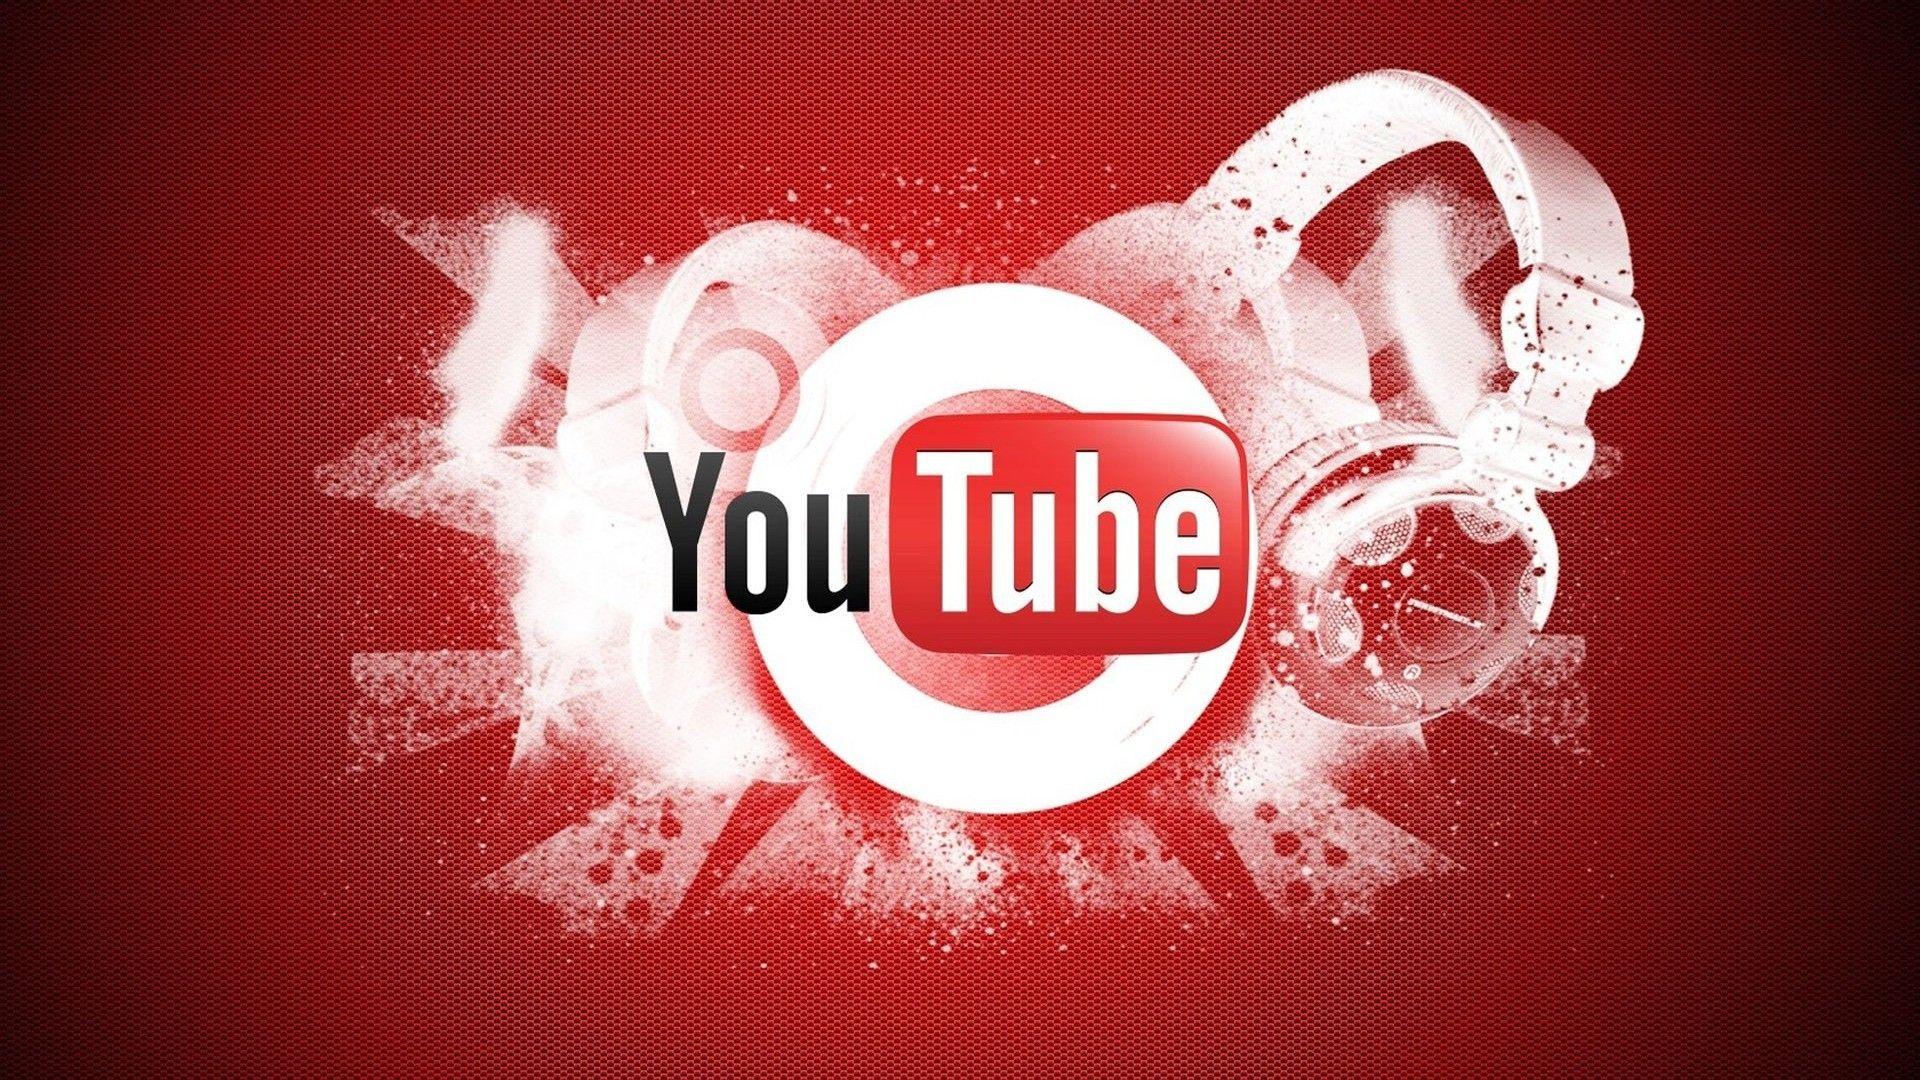 youtube logo wallpaper hd Logotipo do youtube, Idéias